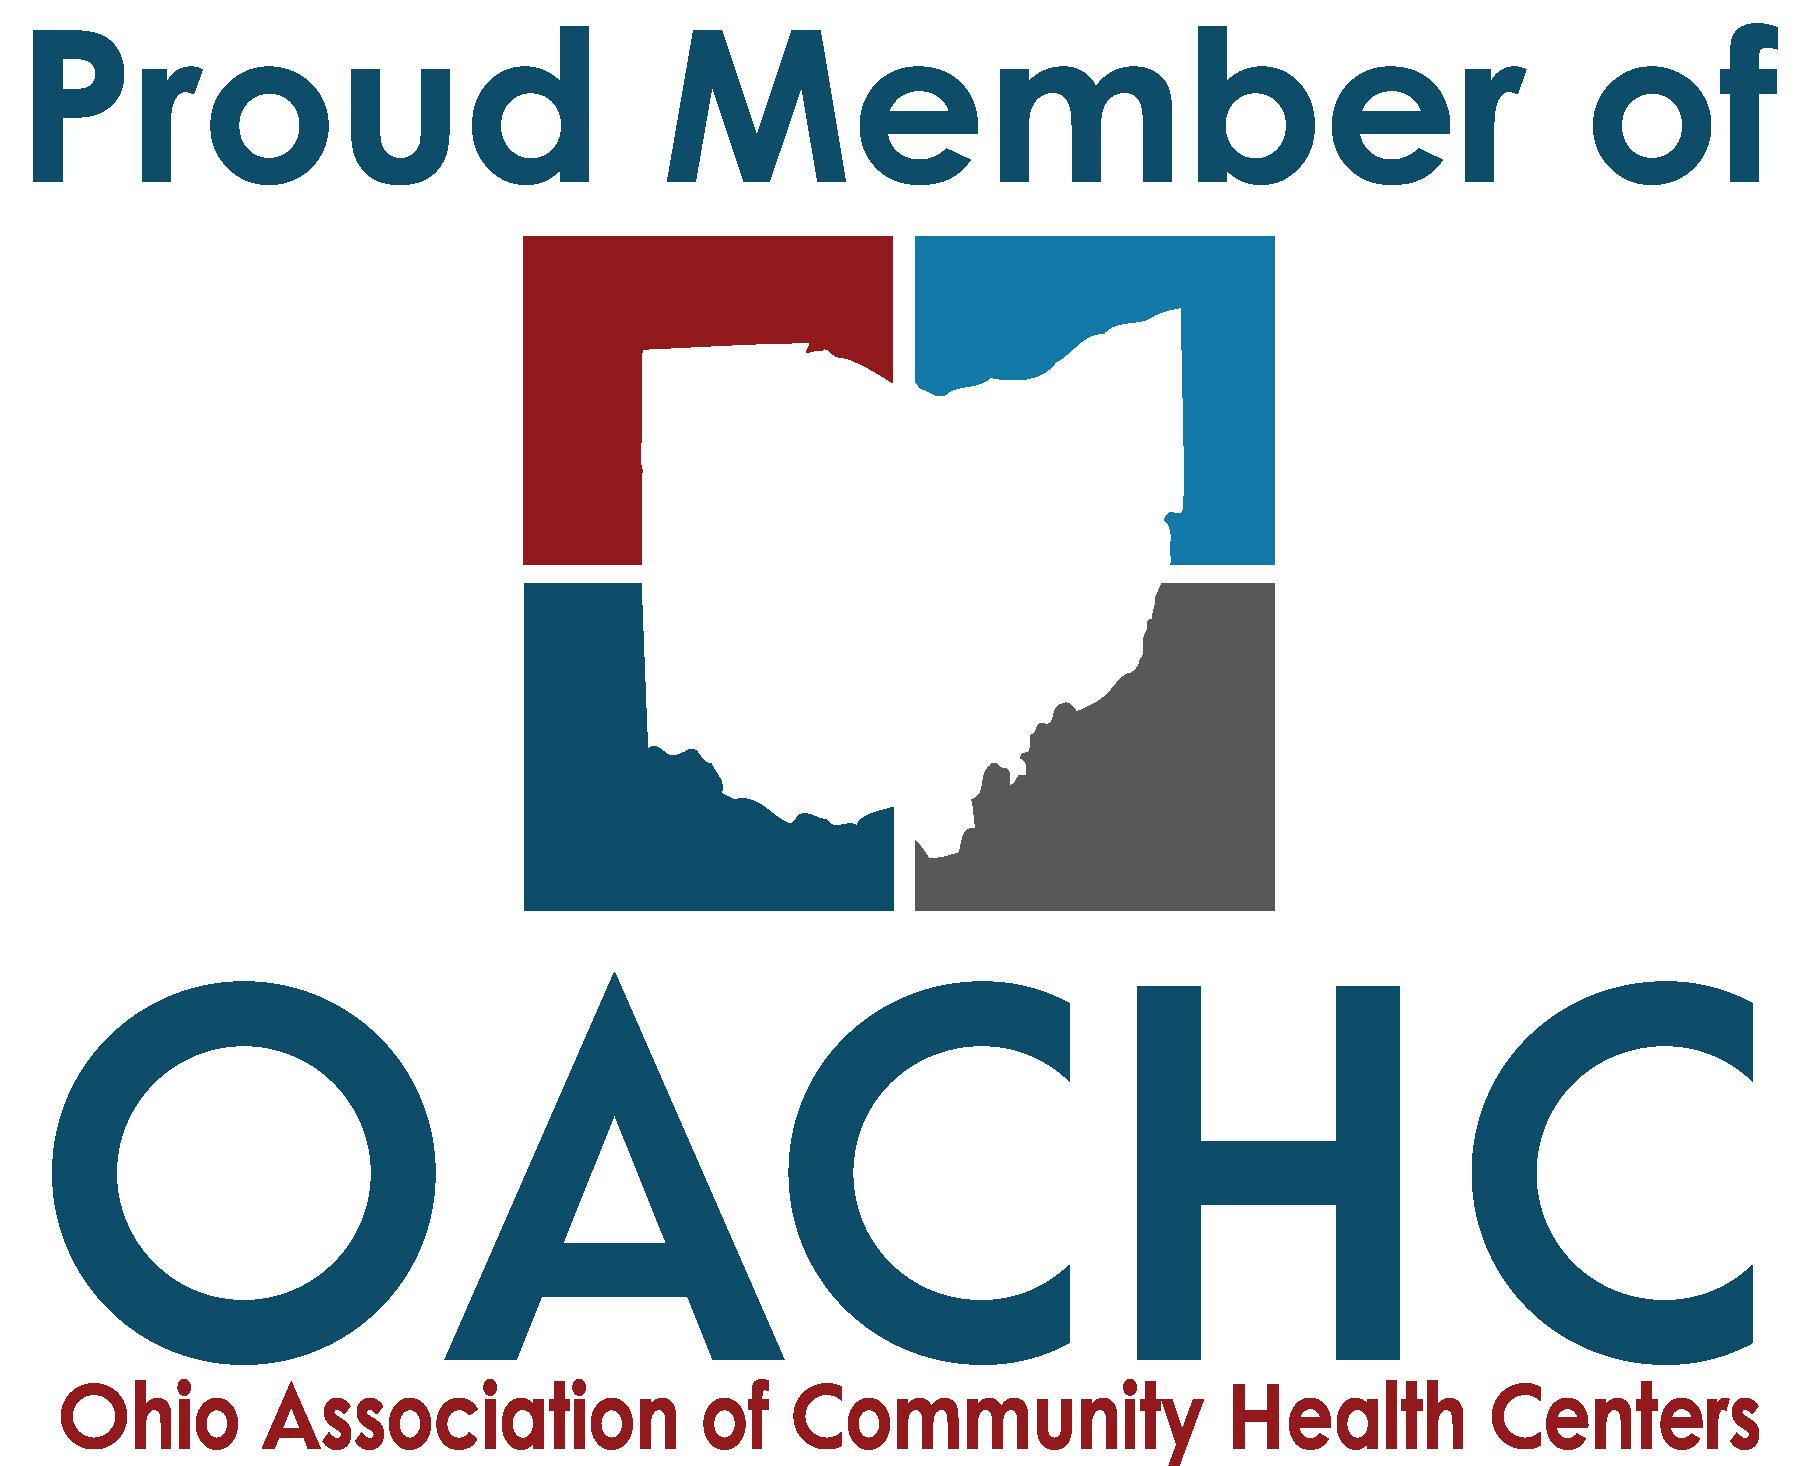 OACHC